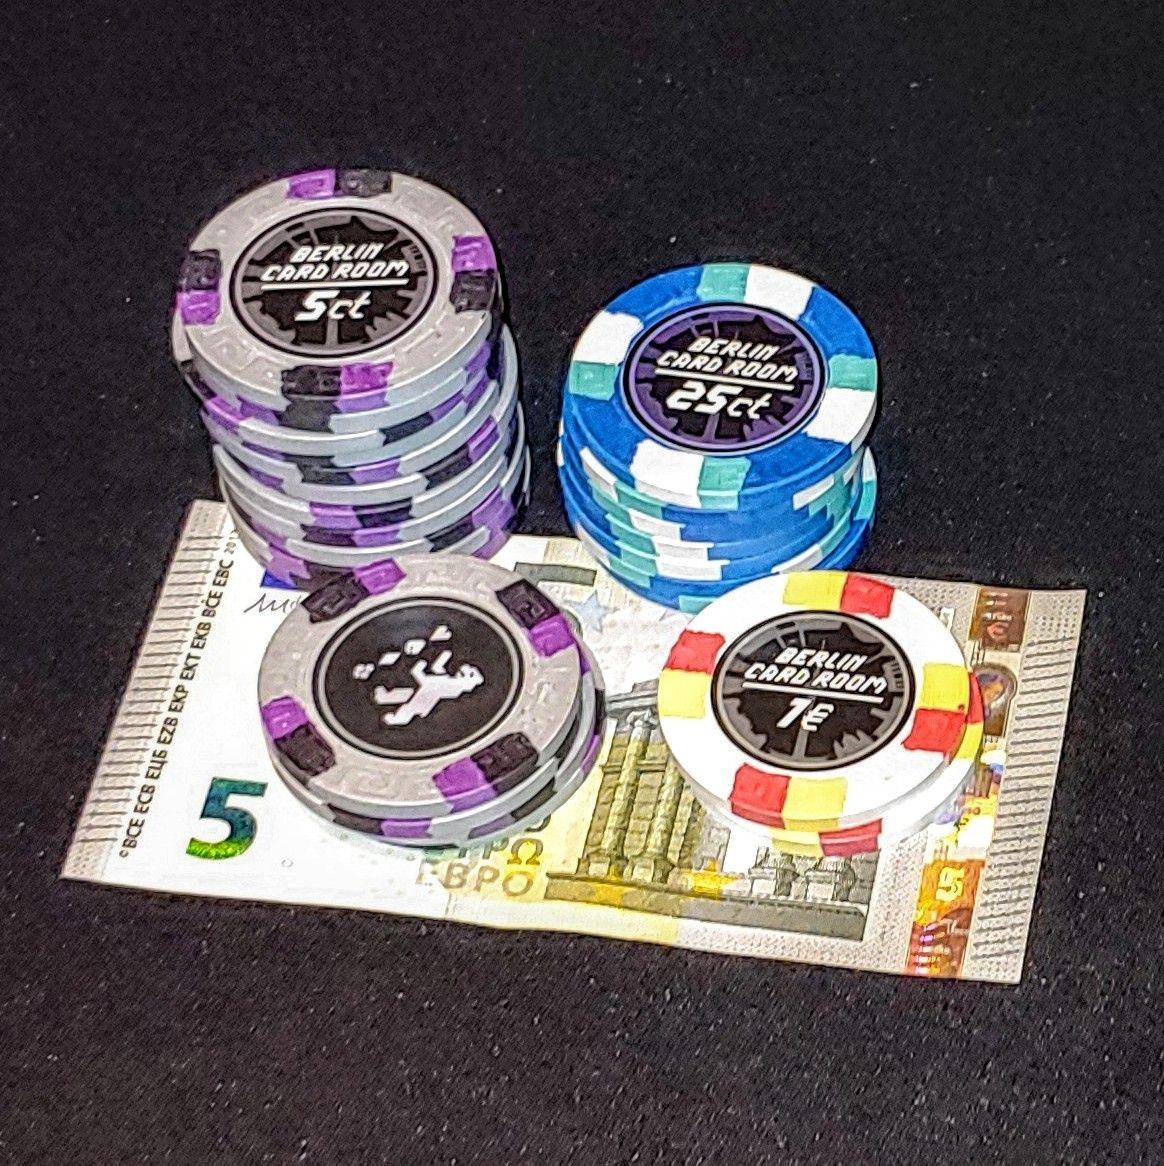 Poker Rooms In Berlin